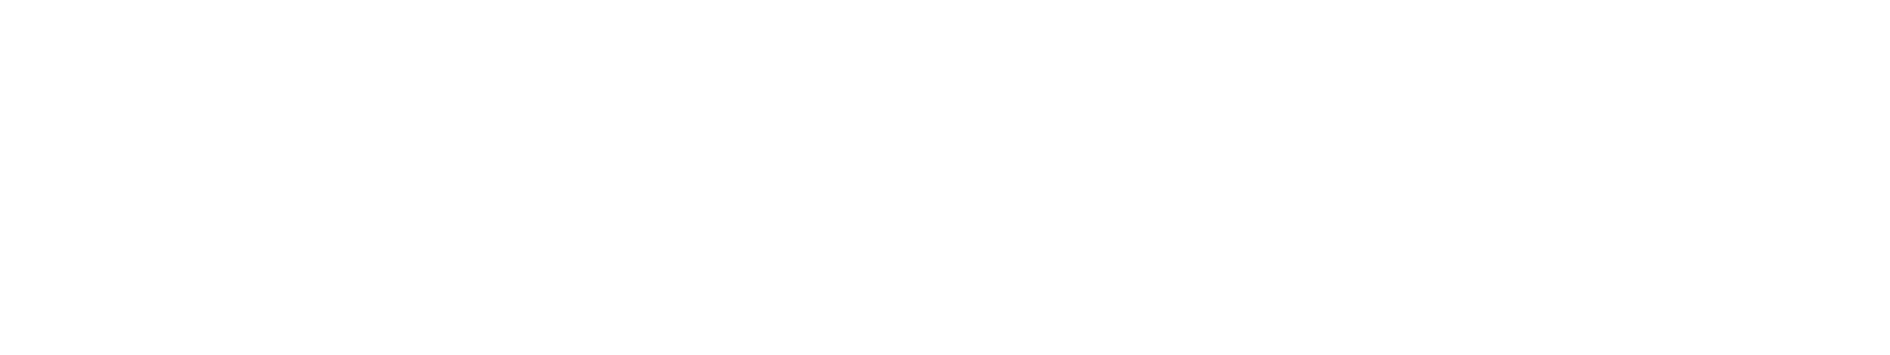 ERGON 750 WG